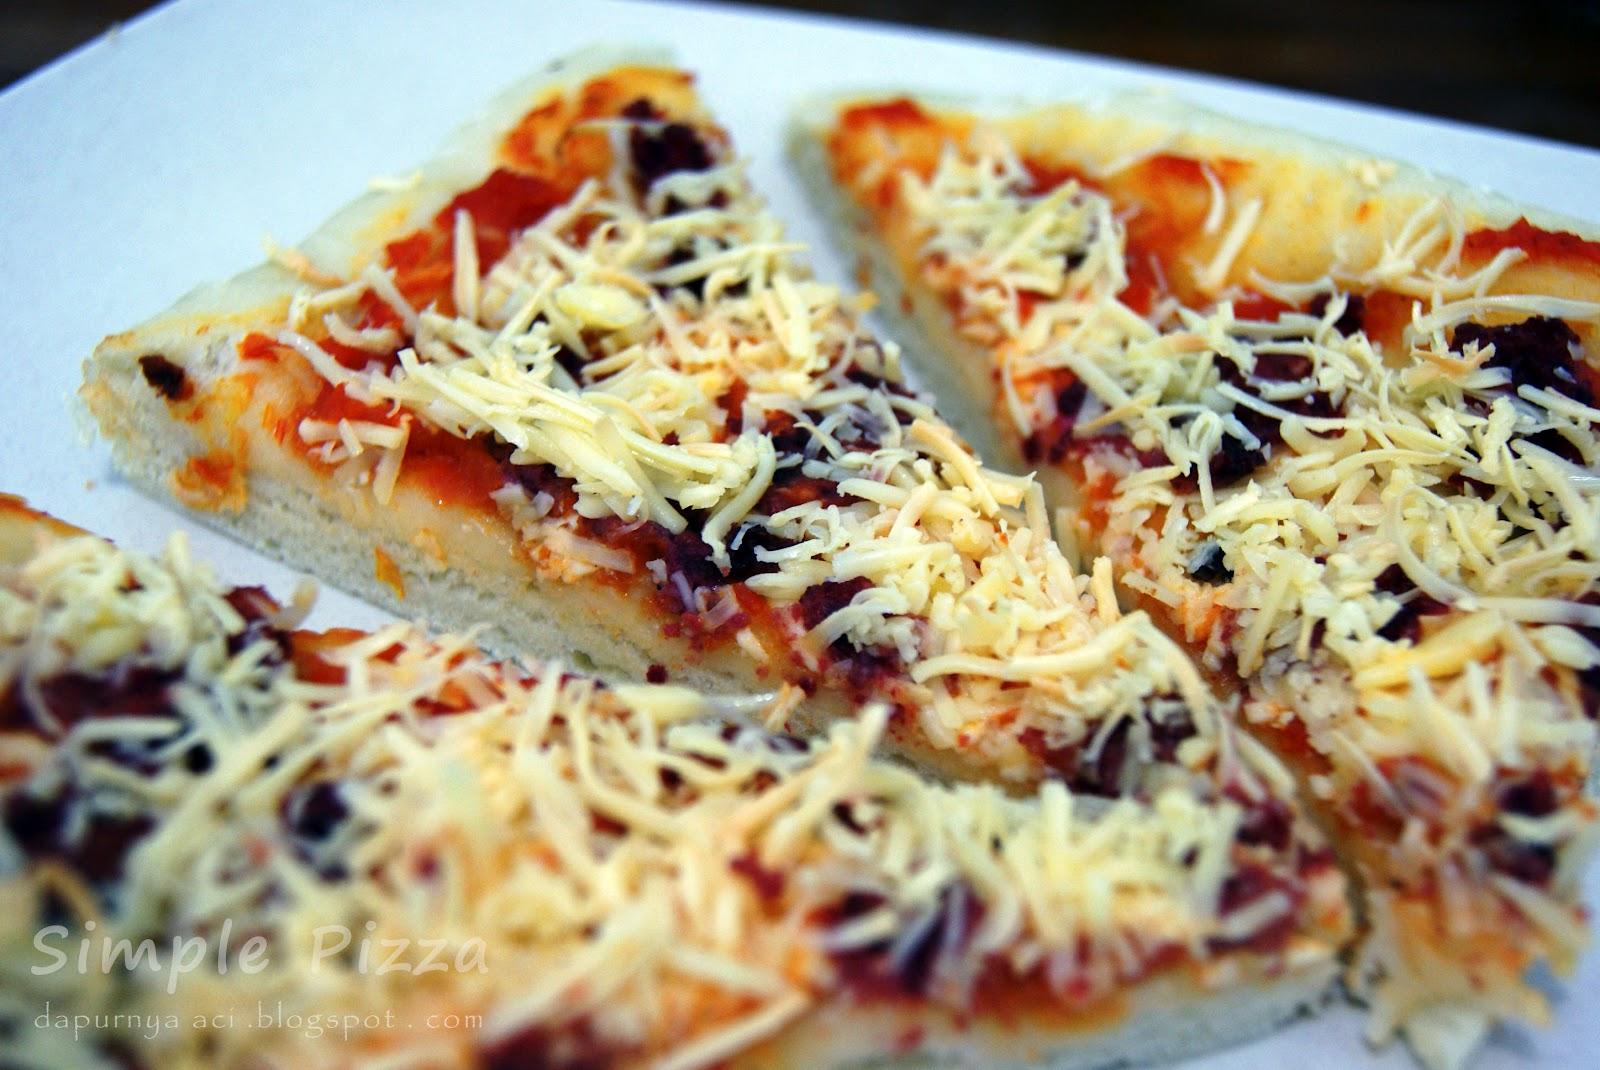 Resep Membuat Pizza Keju Sendiri